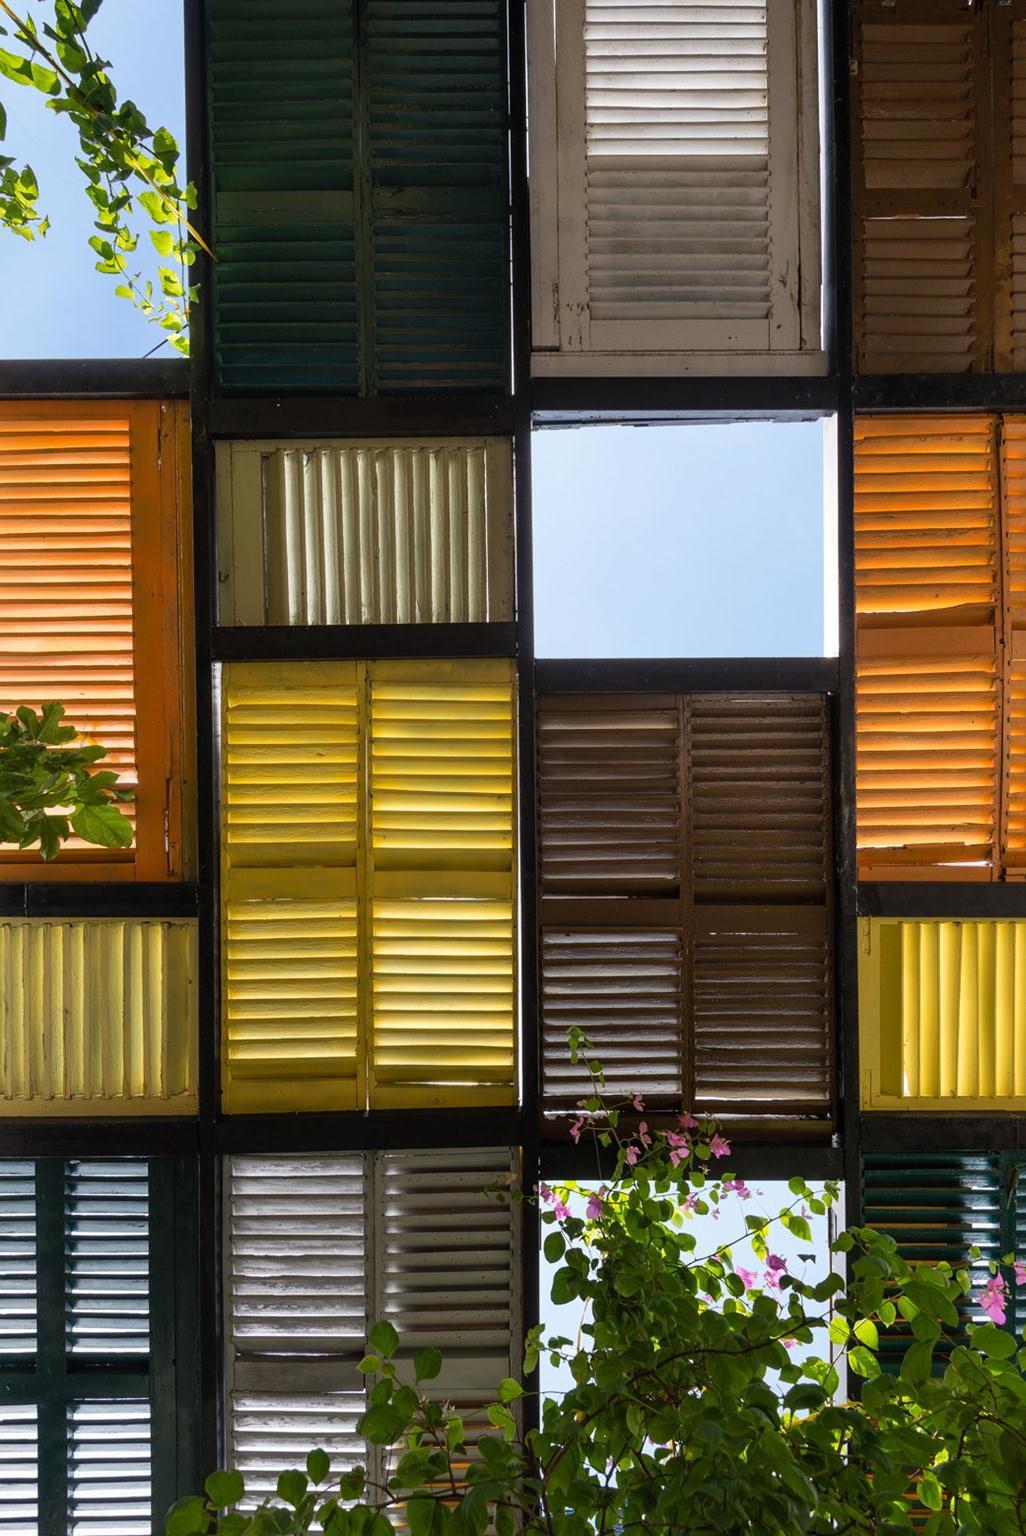 557a5b70e58ecedce5000213_vegan-house-block-architects_21 (Copy)